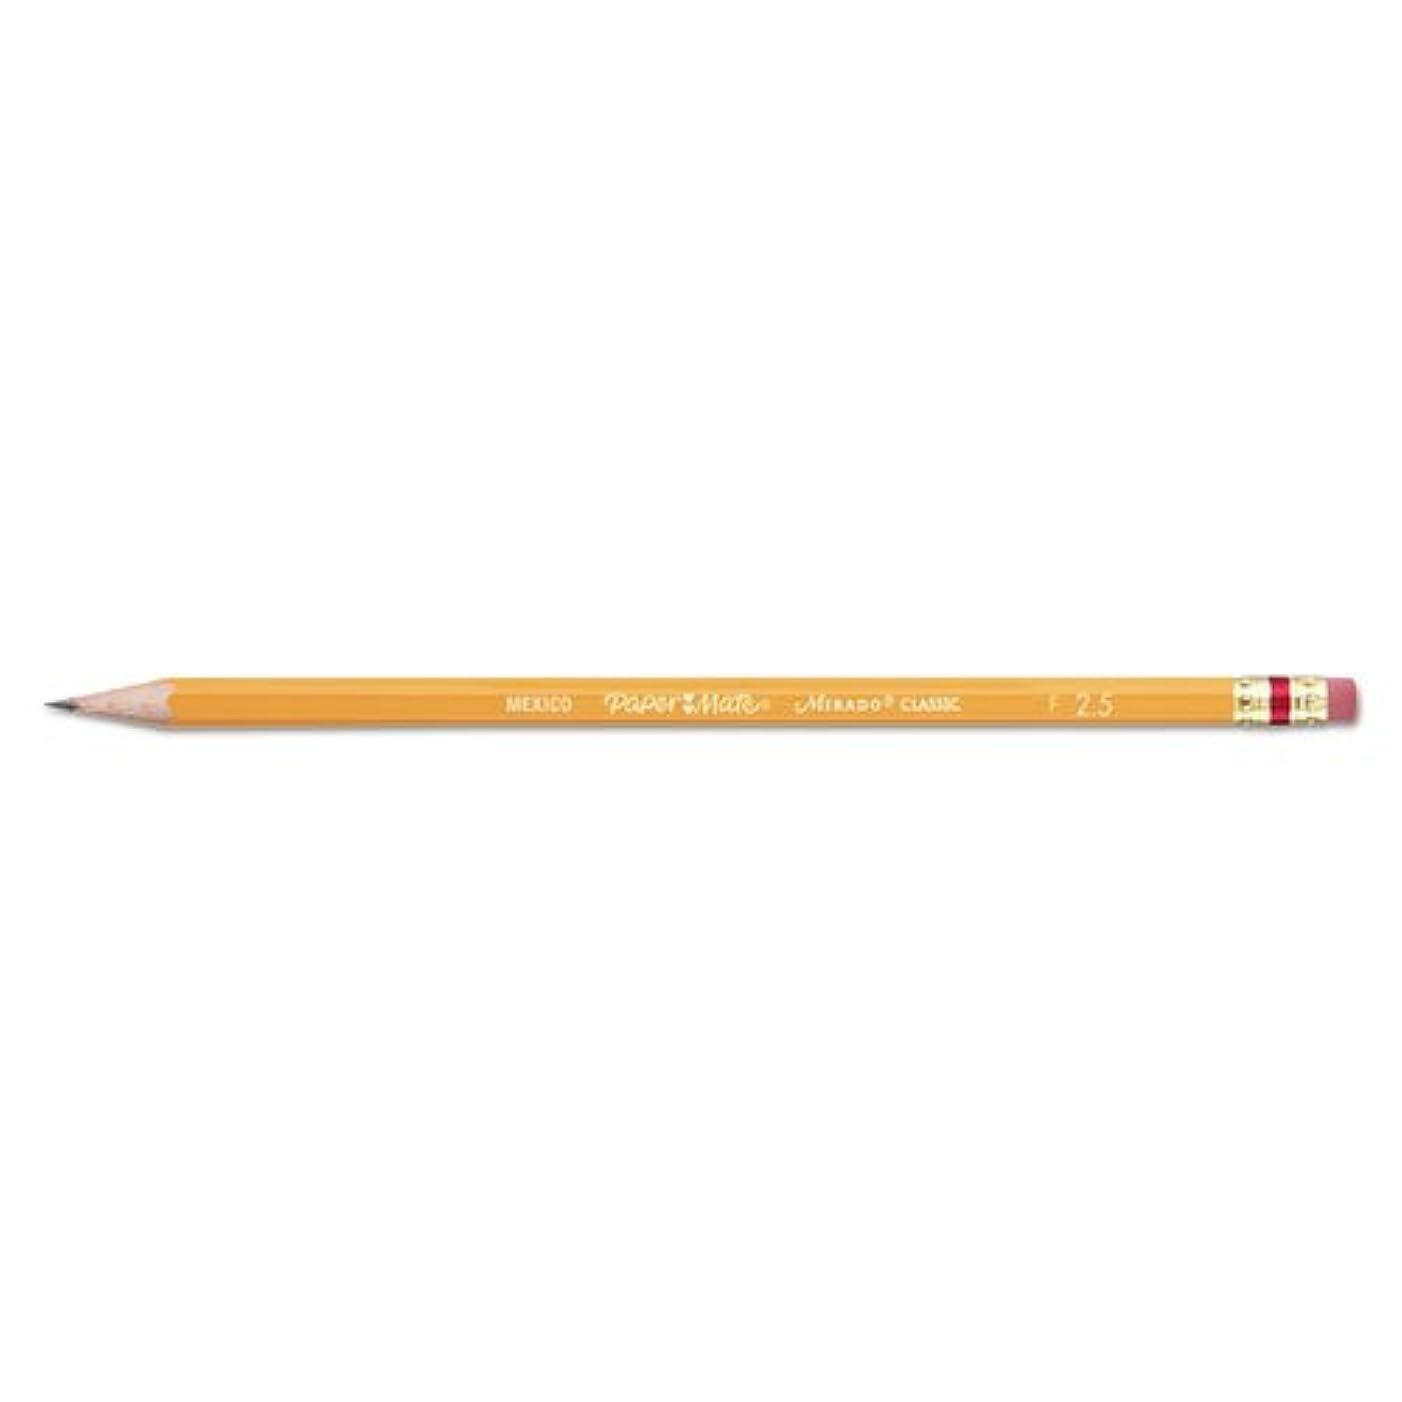 Paper Mate 2098 Mirado Pencil, No 2-1/2 Med.Firm Lead, 12 Pencils, Yellow